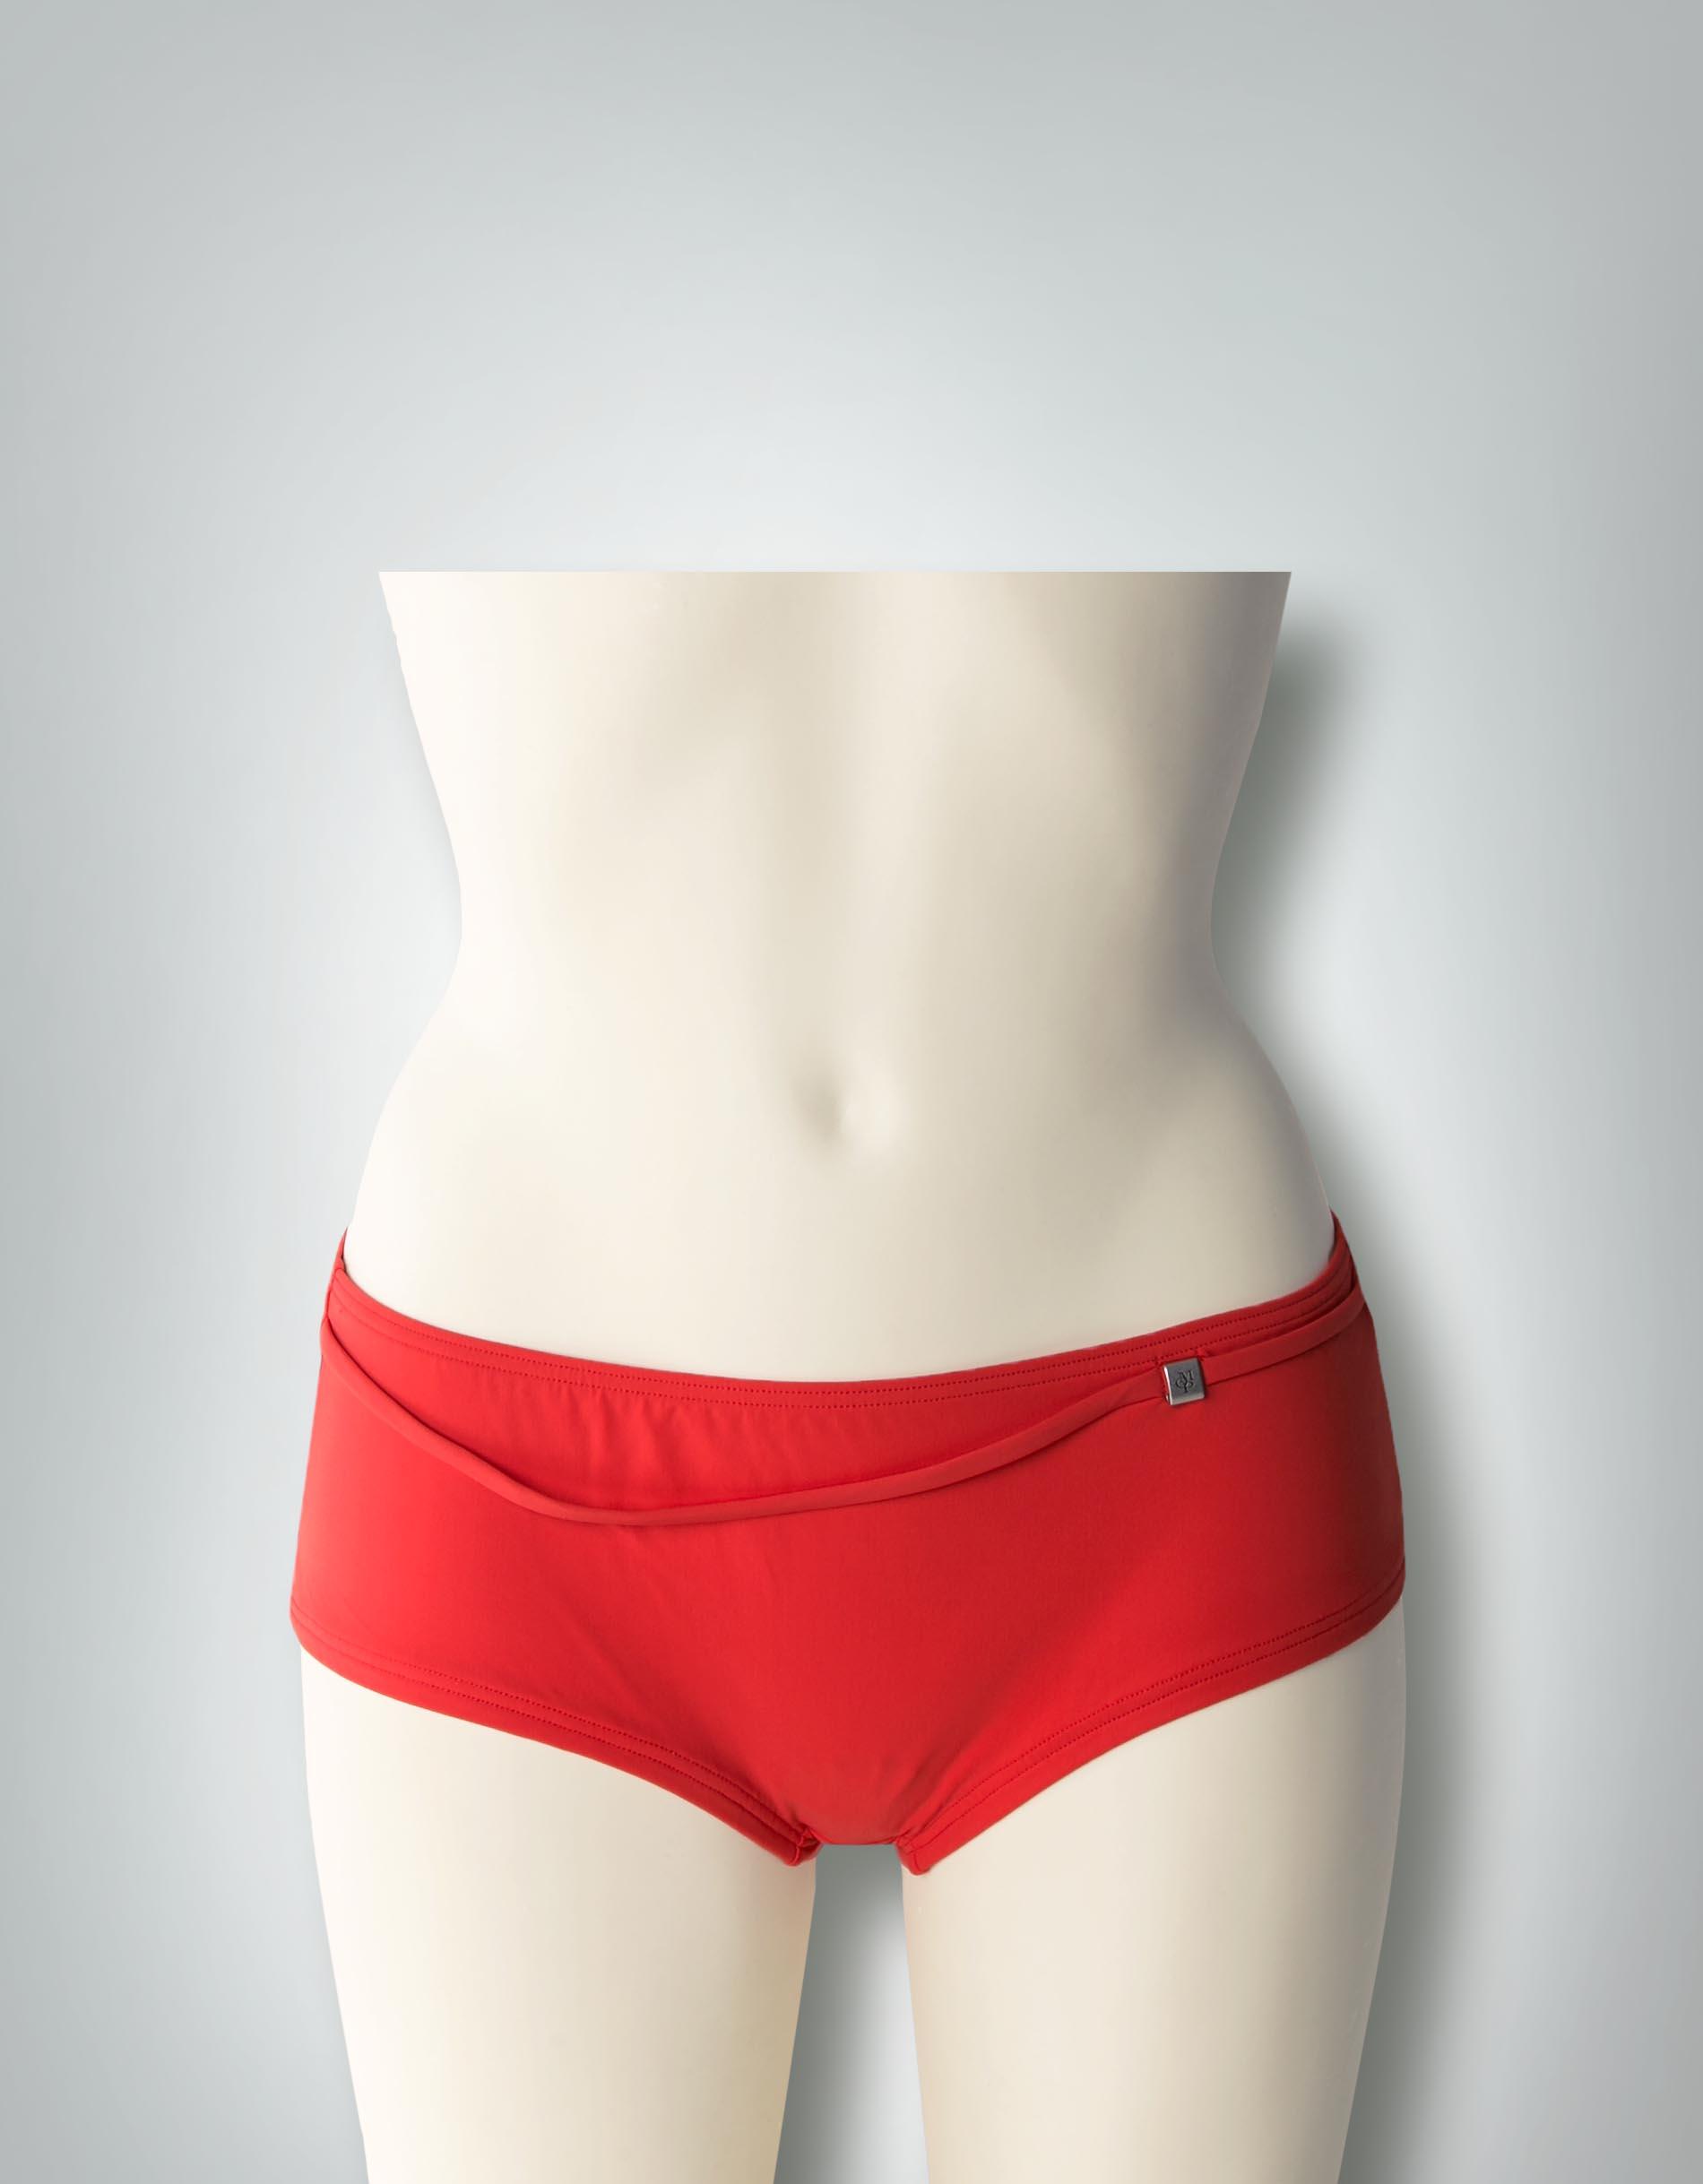 marc o 39 polo damen bikini panty mit zierendem band. Black Bedroom Furniture Sets. Home Design Ideas